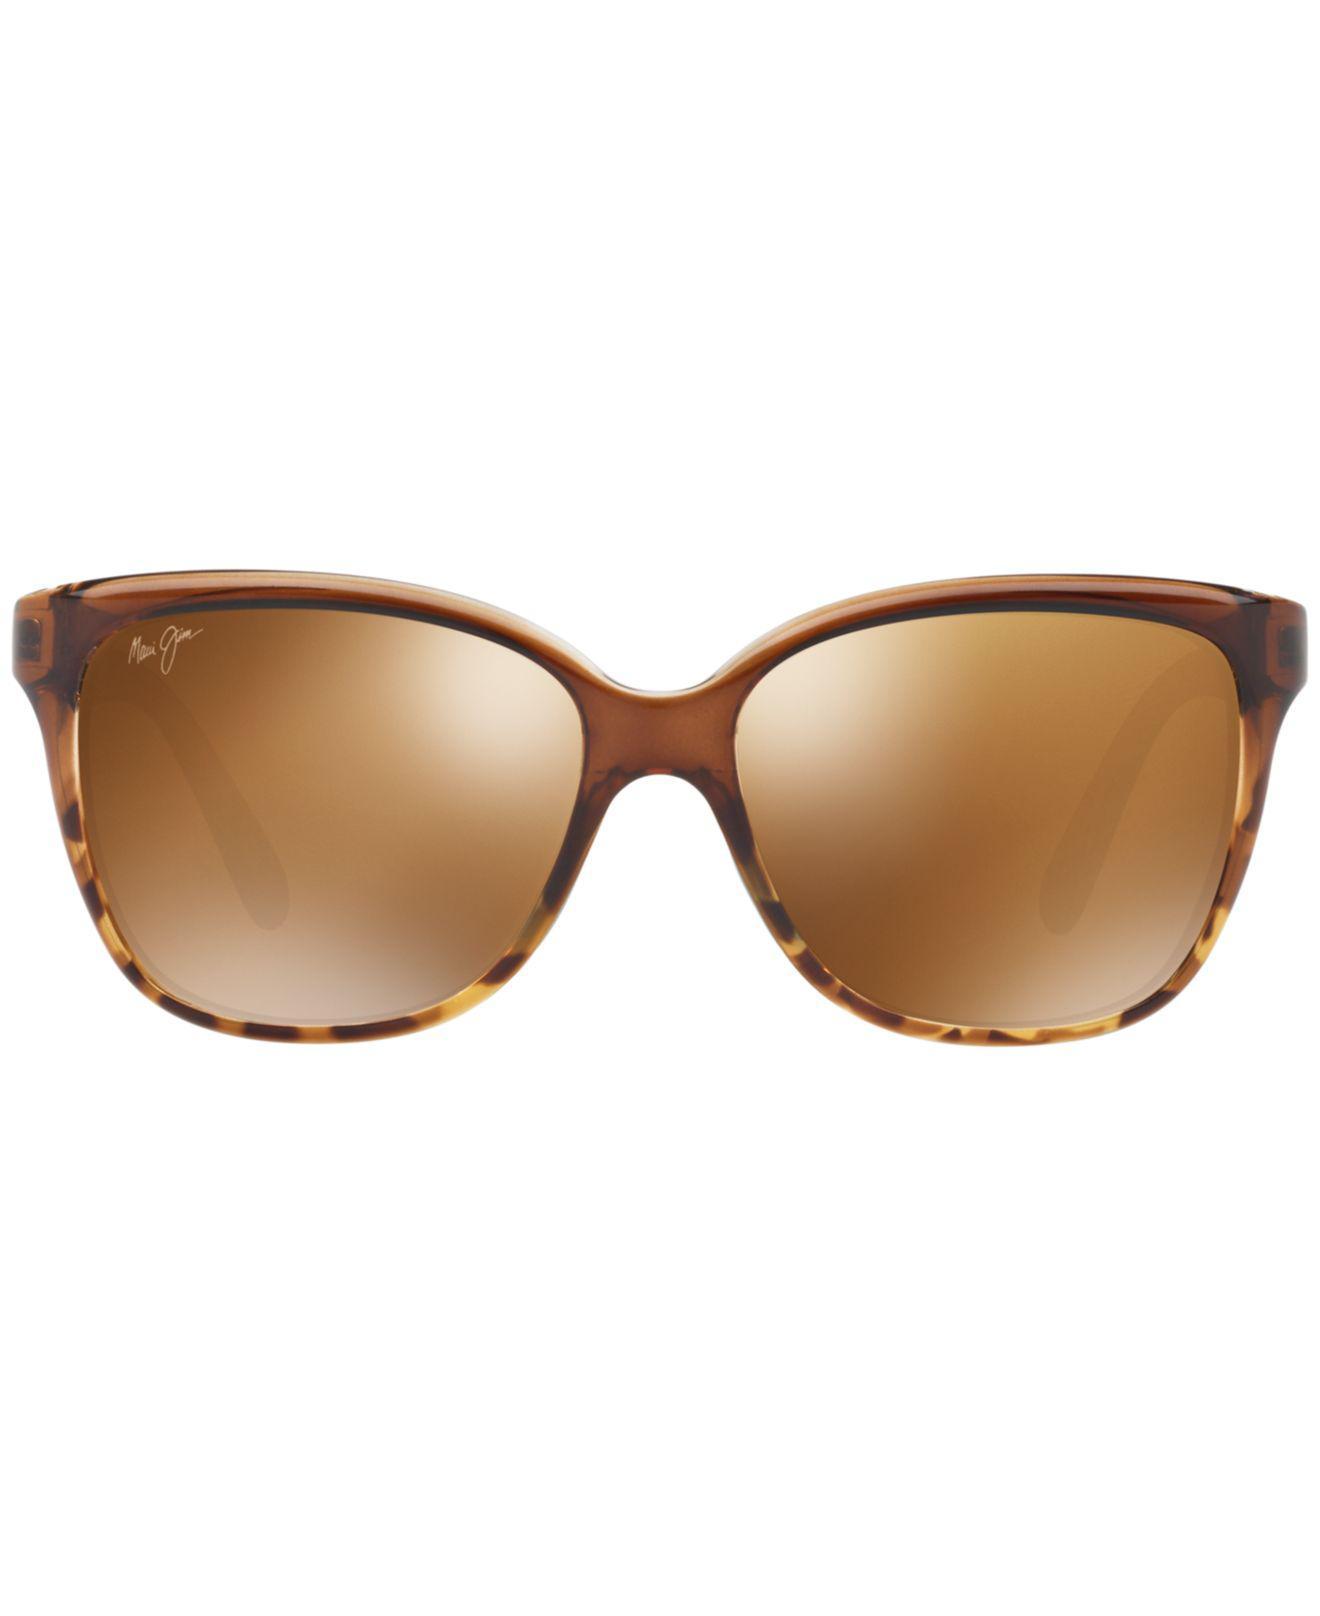 885c81f863 Maui jim tortoisebronze gradient polar polarized starfish sunglasses jpg  1320x1616 Starfish sandstone color polarized lenses sunglasses